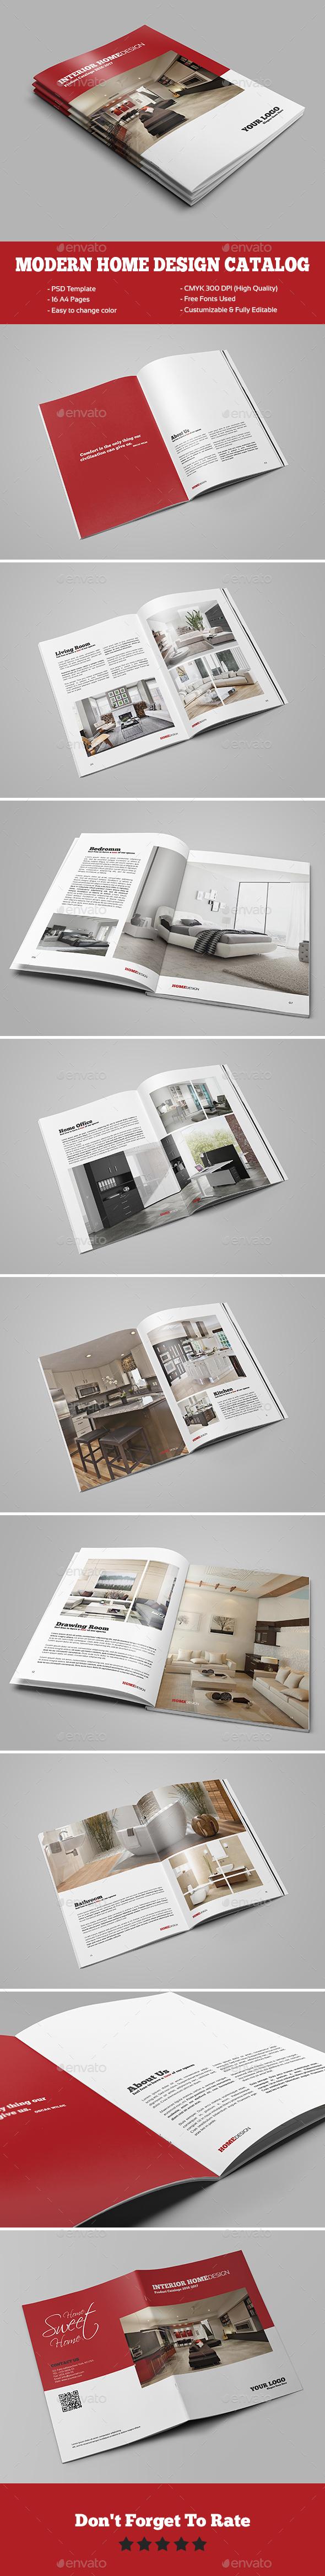 Modern Home Design Brochure/Catalog - Catalogs Brochures